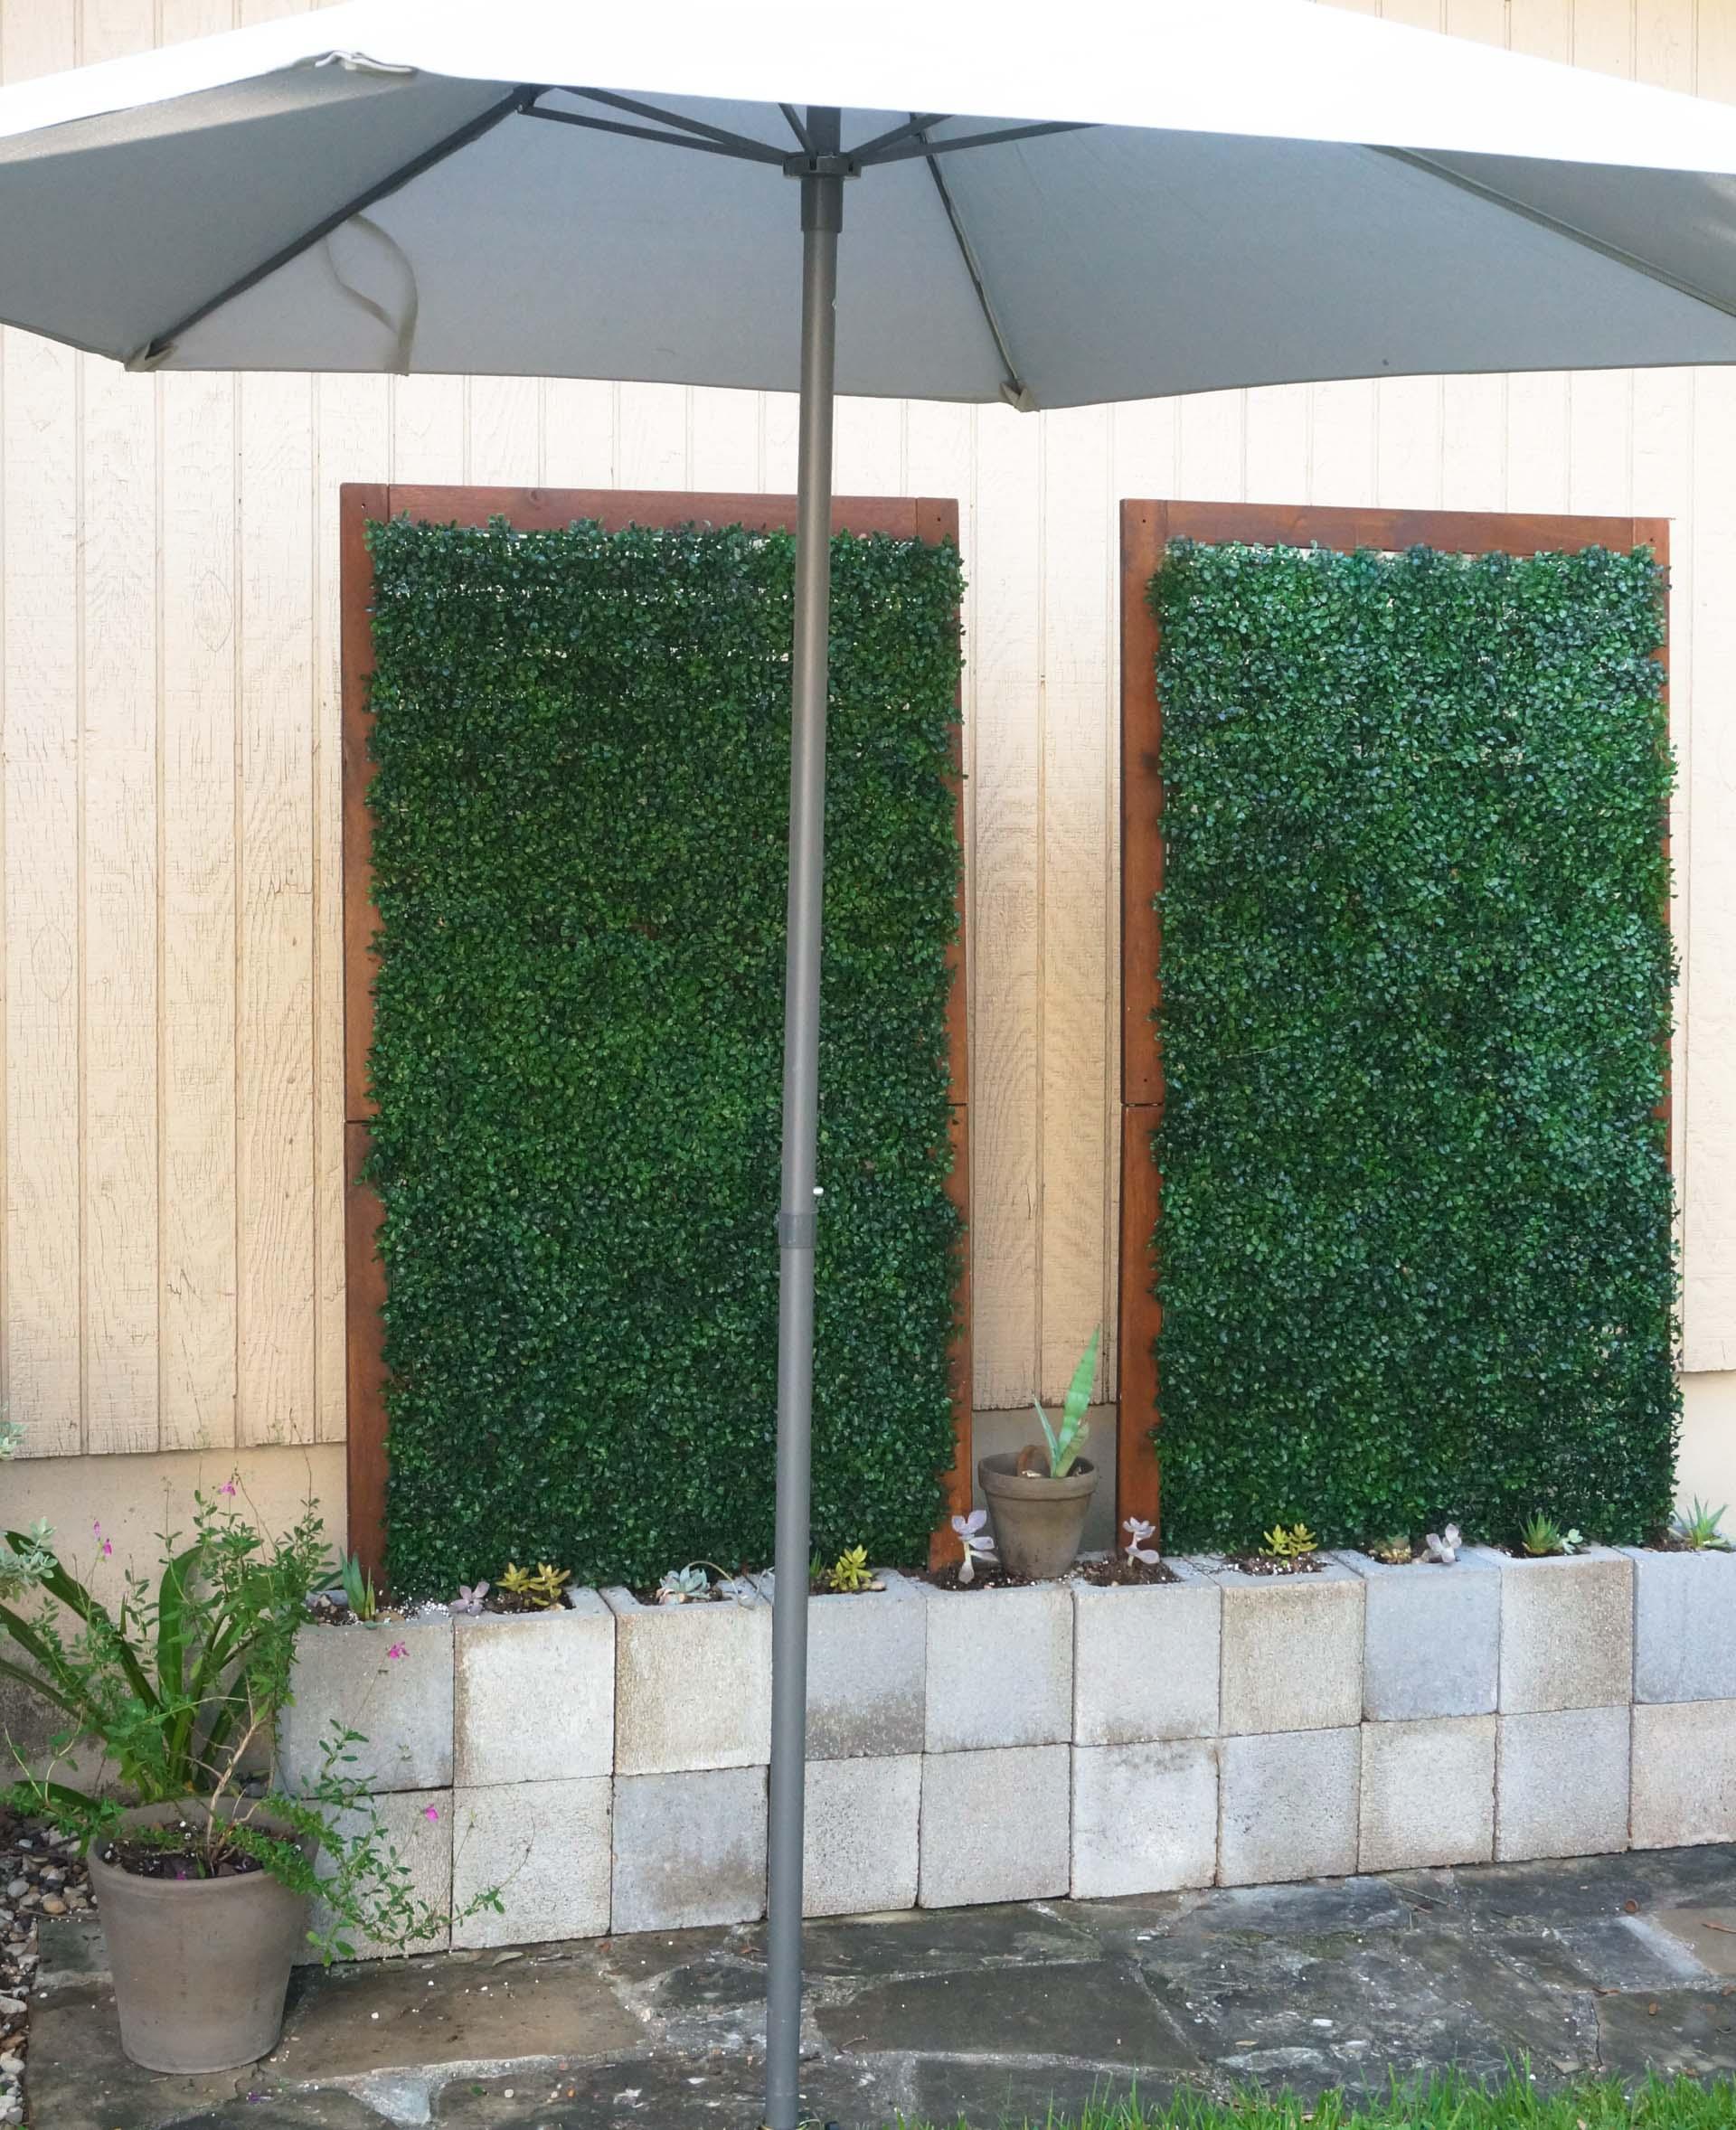 1562169714 702 backyard decorating ideas on a budget - Backyard Decorating Ideas on a Budget